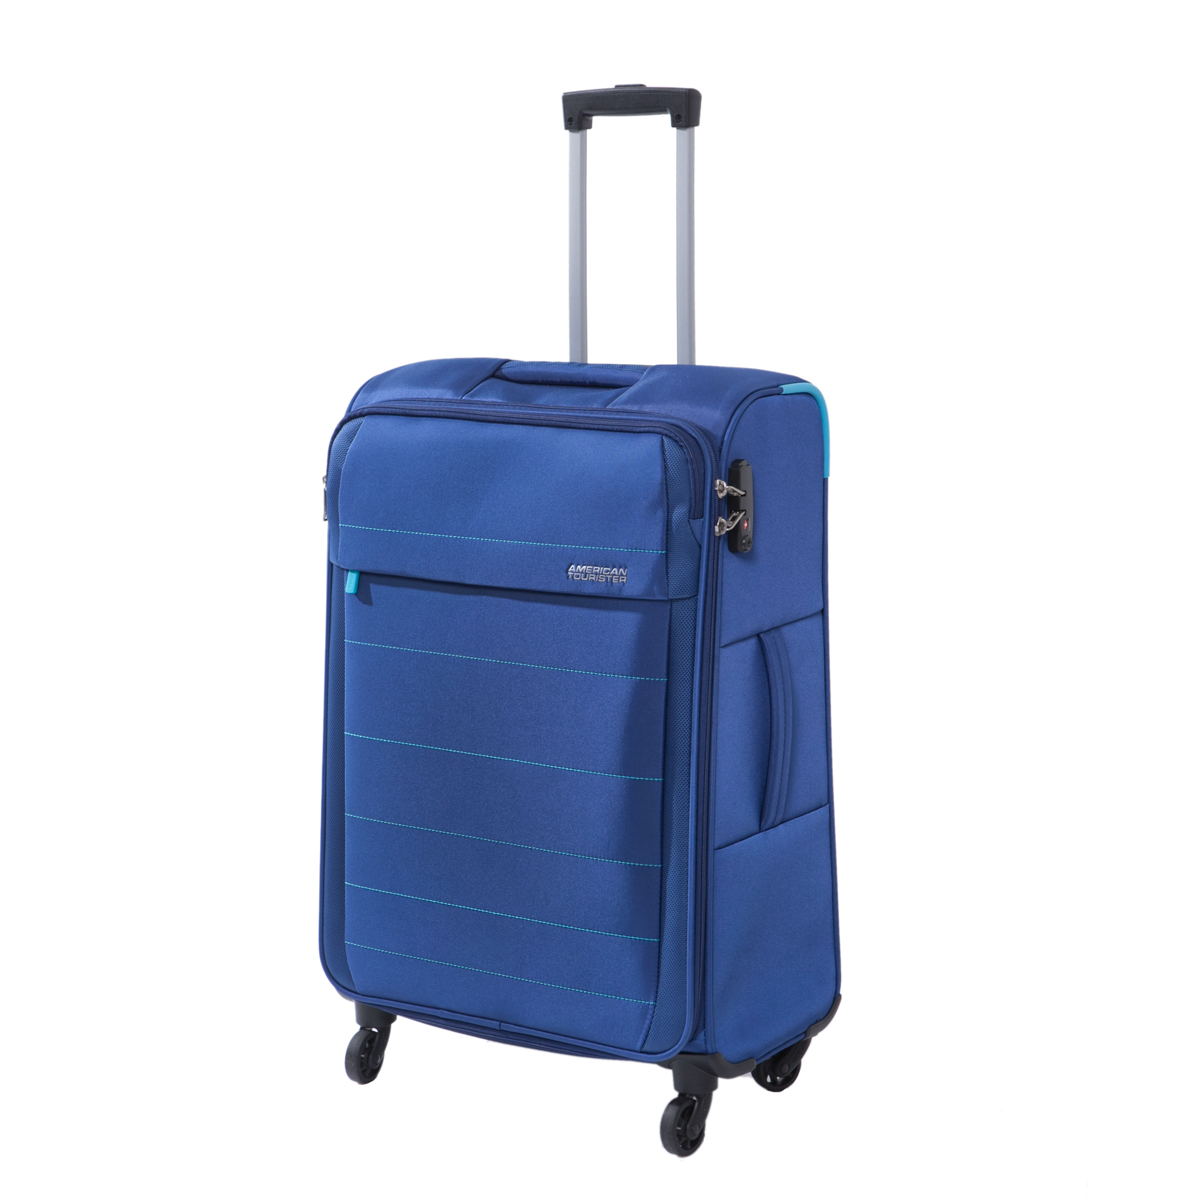 AMERICAN TOURISTER – Βαλίτσα μεσαία TIDAL American Tourister μπλε